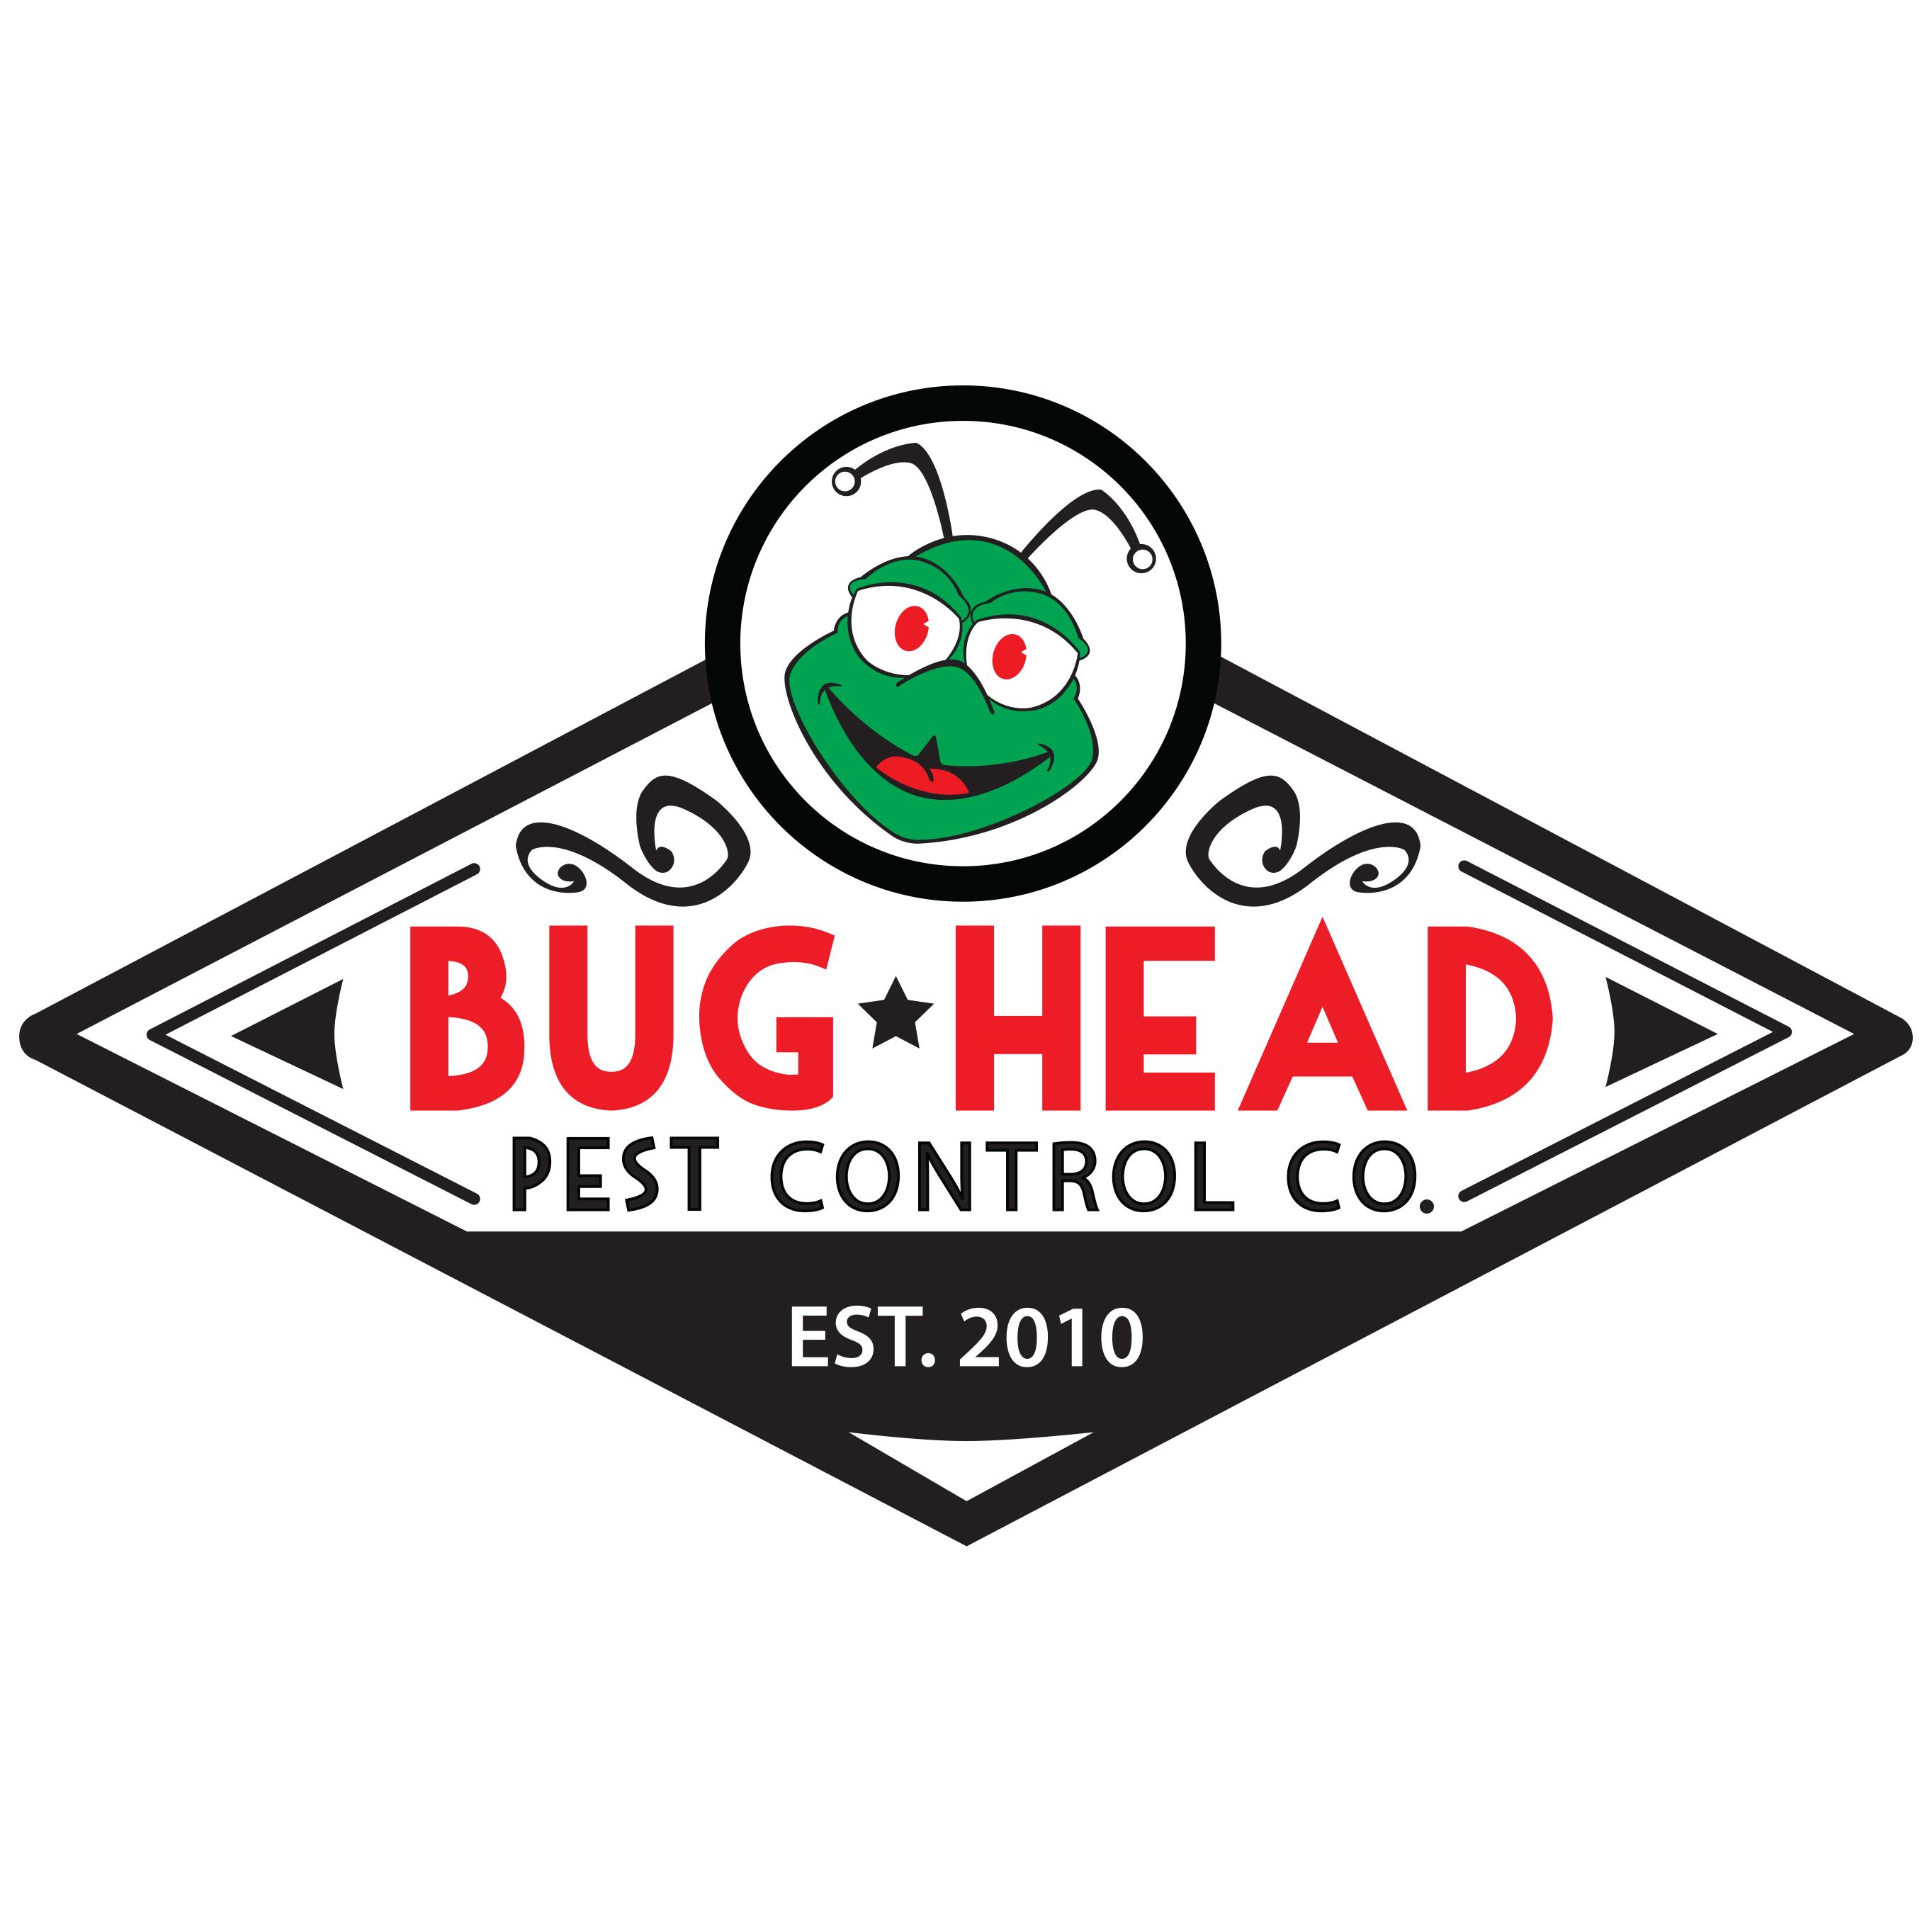 BugHead Pest Control